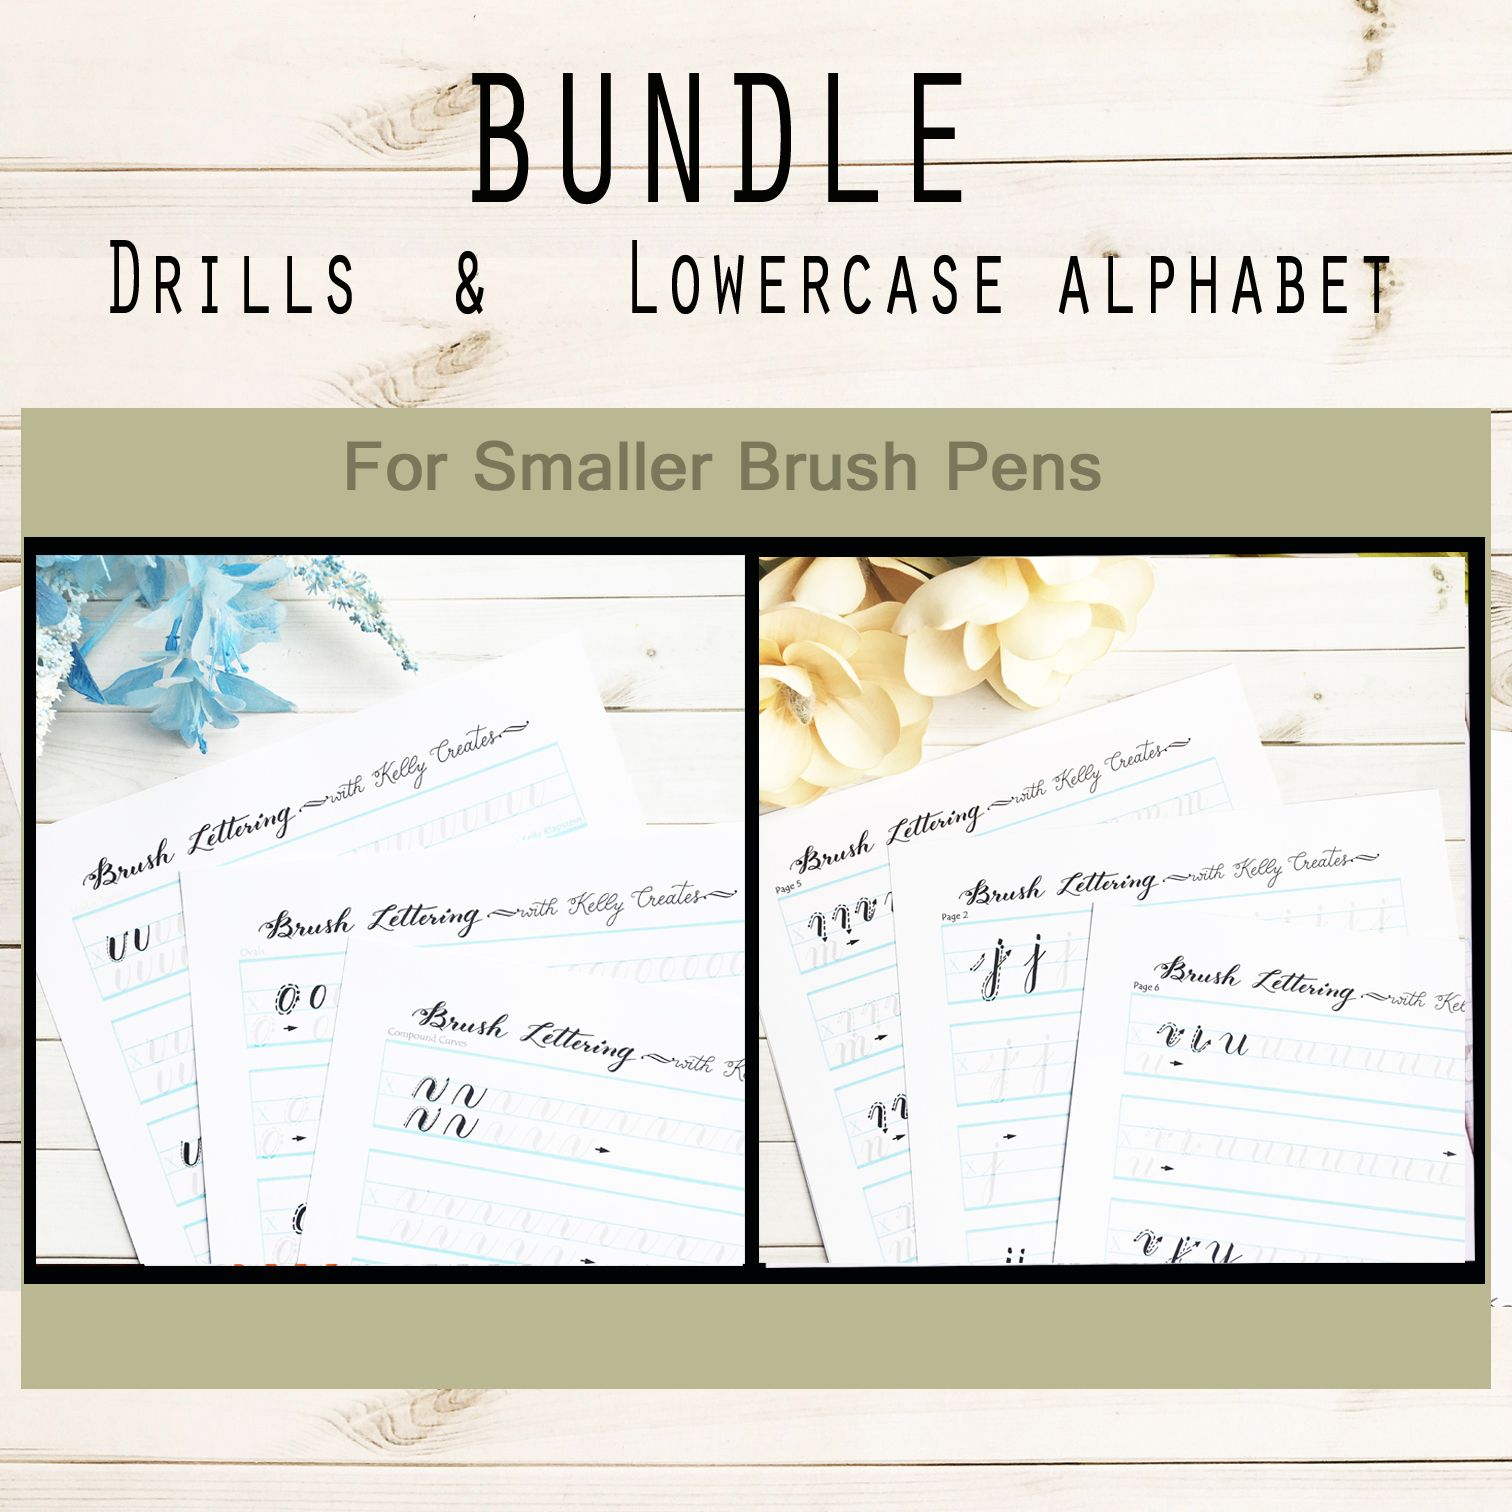 Bundle 2 Drills Amp Lowercase Alphabet For Small Brush Pens